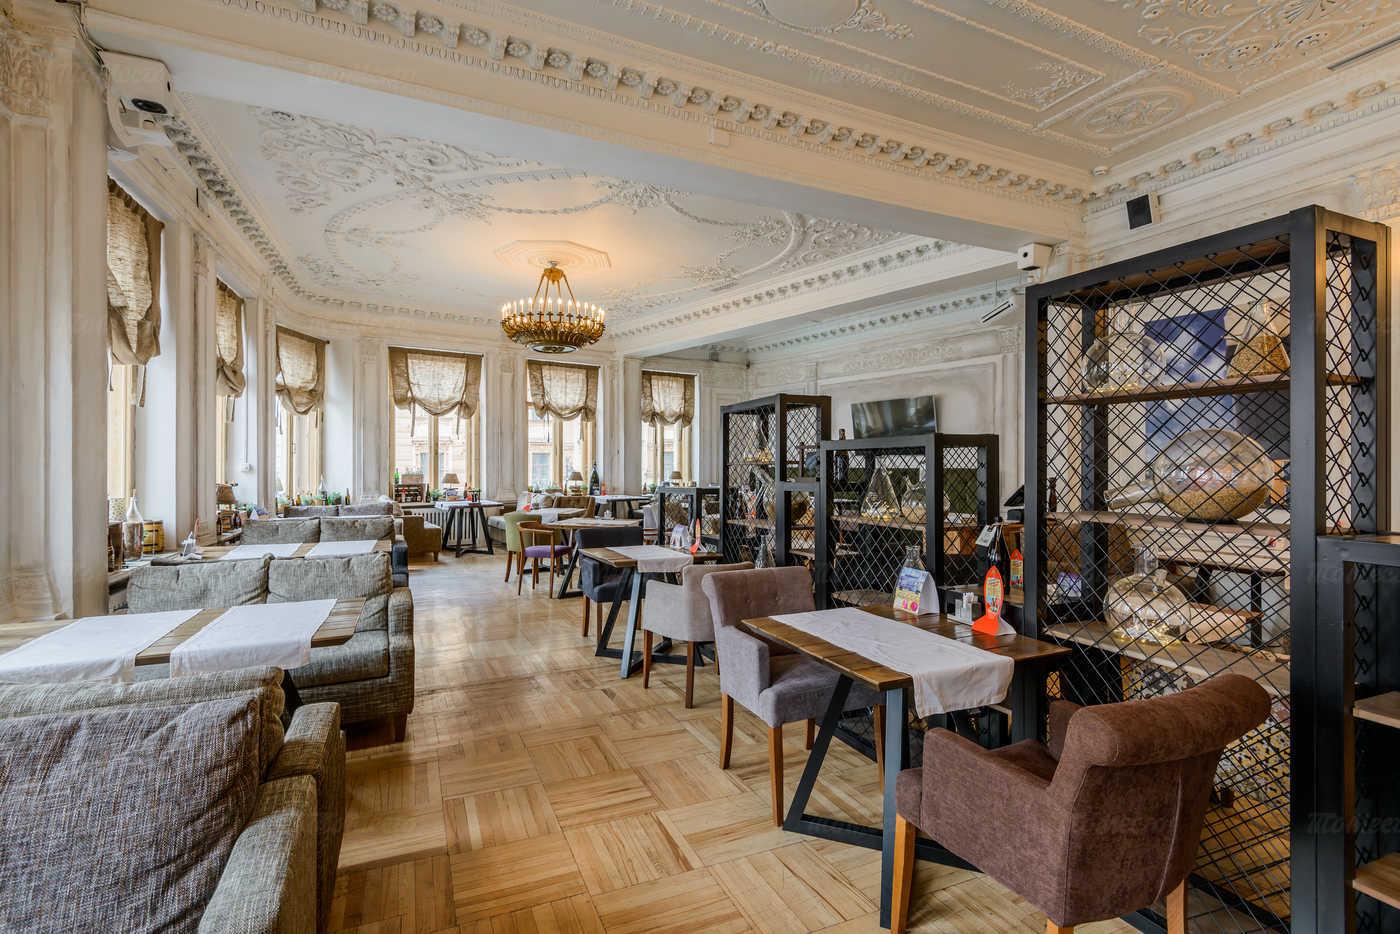 Ресторан Шато Винтаж (Chateau Vintage) на Невском проспекте фото 13